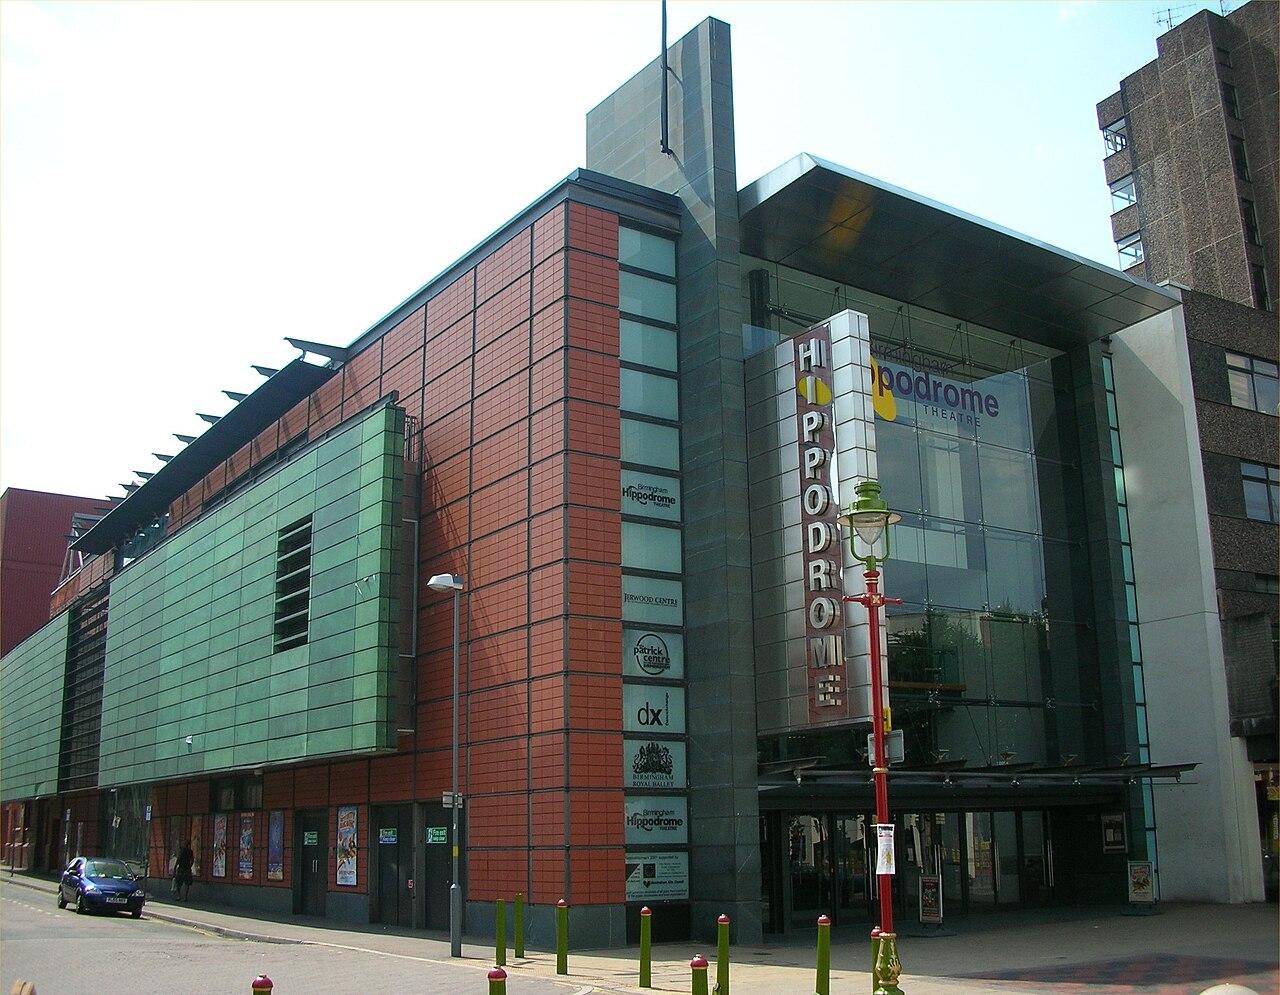 http://upload.wikimedia.org/wikipedia/commons/thumb/e/e5/Birmingham_Hippodrome.jpg/1280px-Birmingham_Hippodrome.jpg